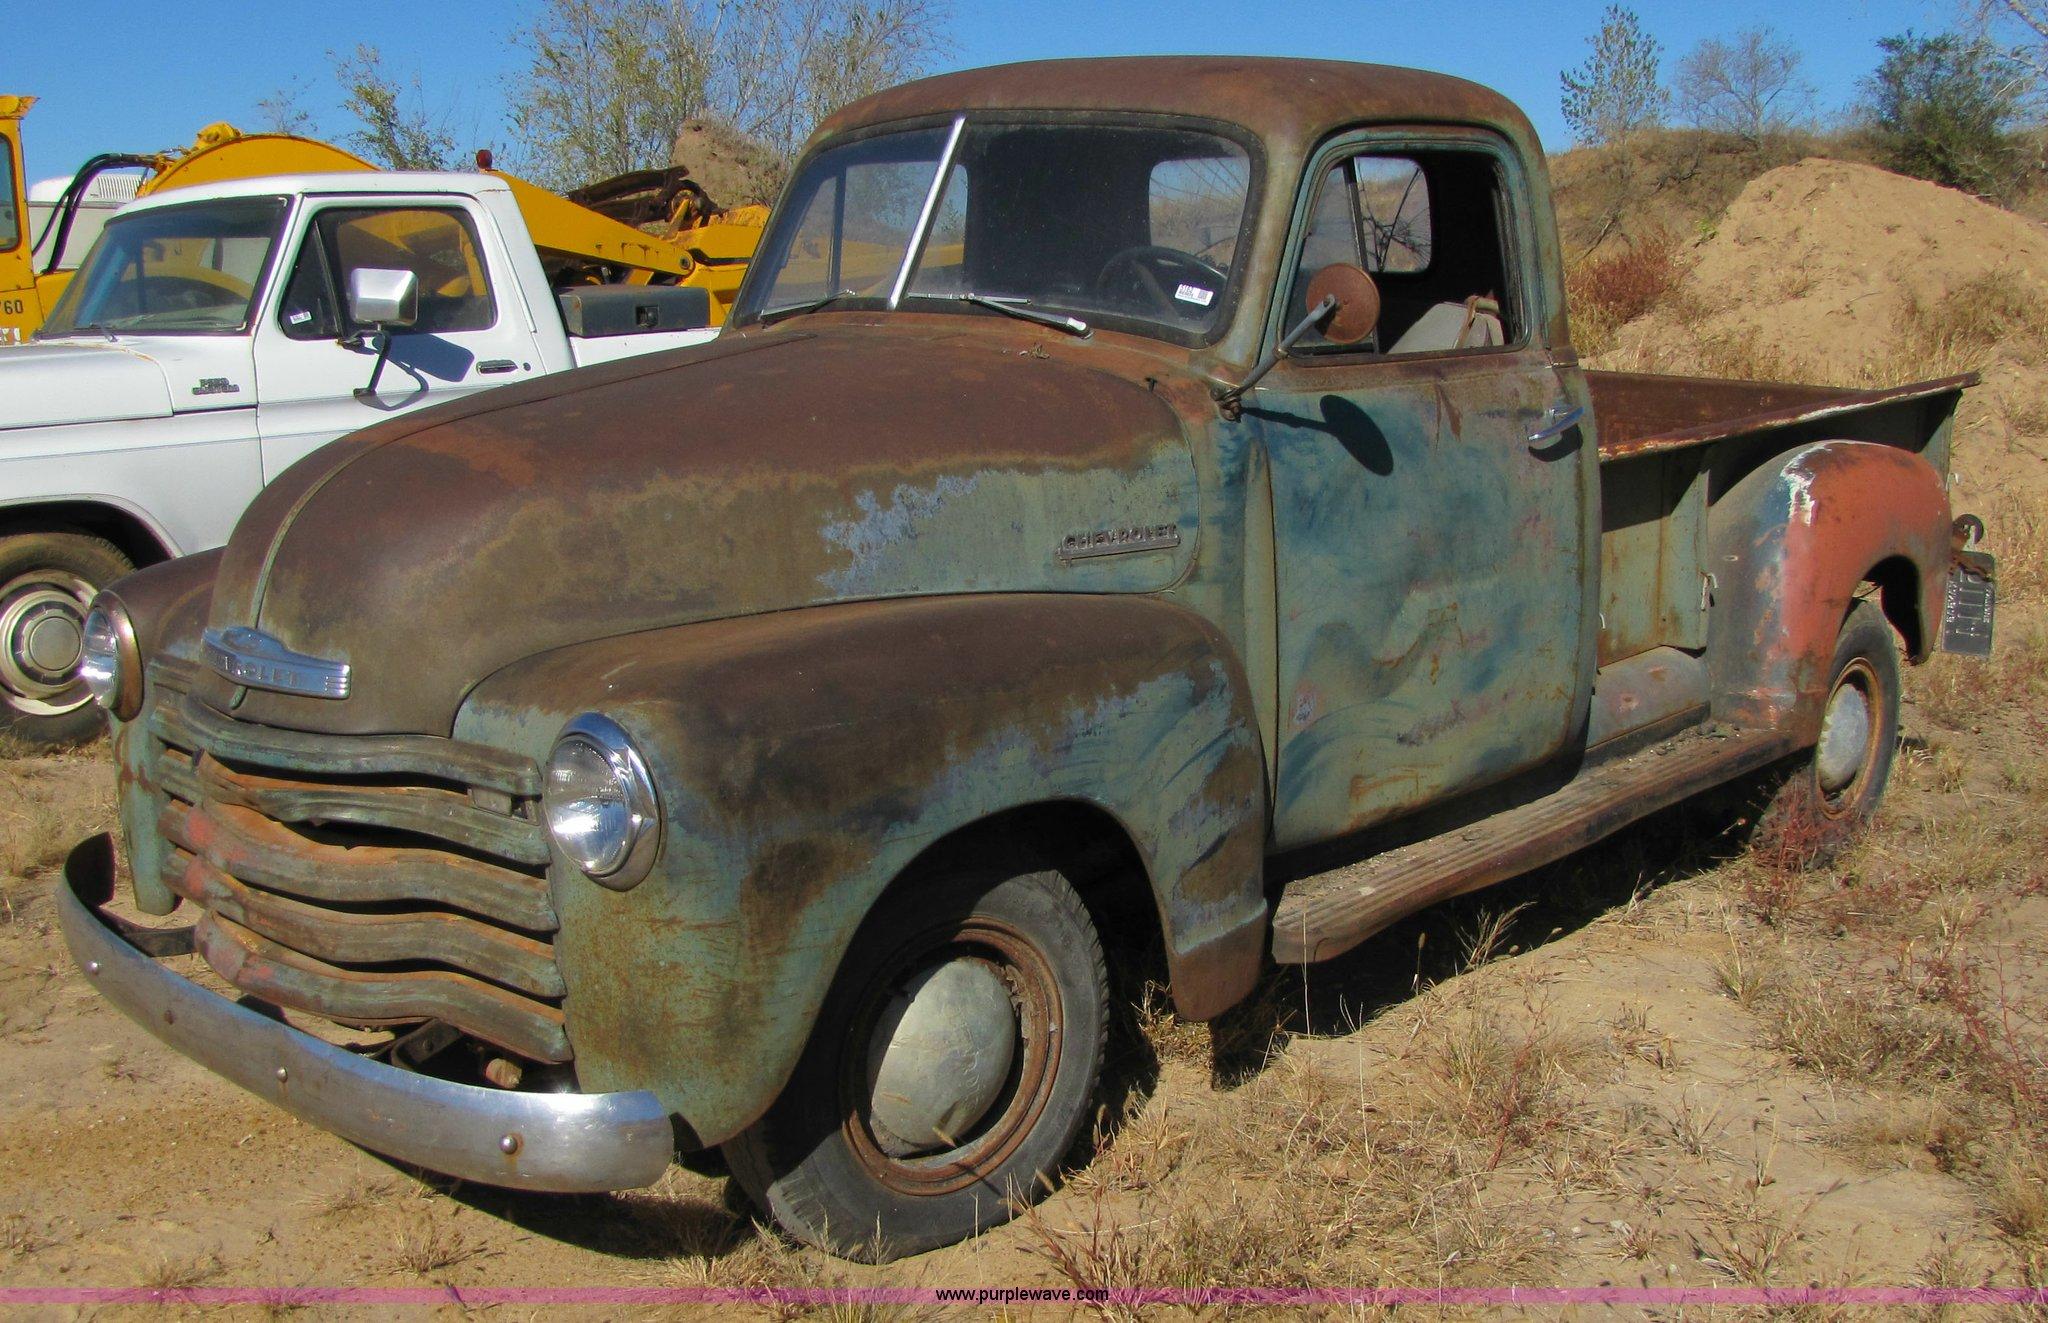 1951 Chevrolet 5600 3/4 ton pickup truck | Item 5162 ...